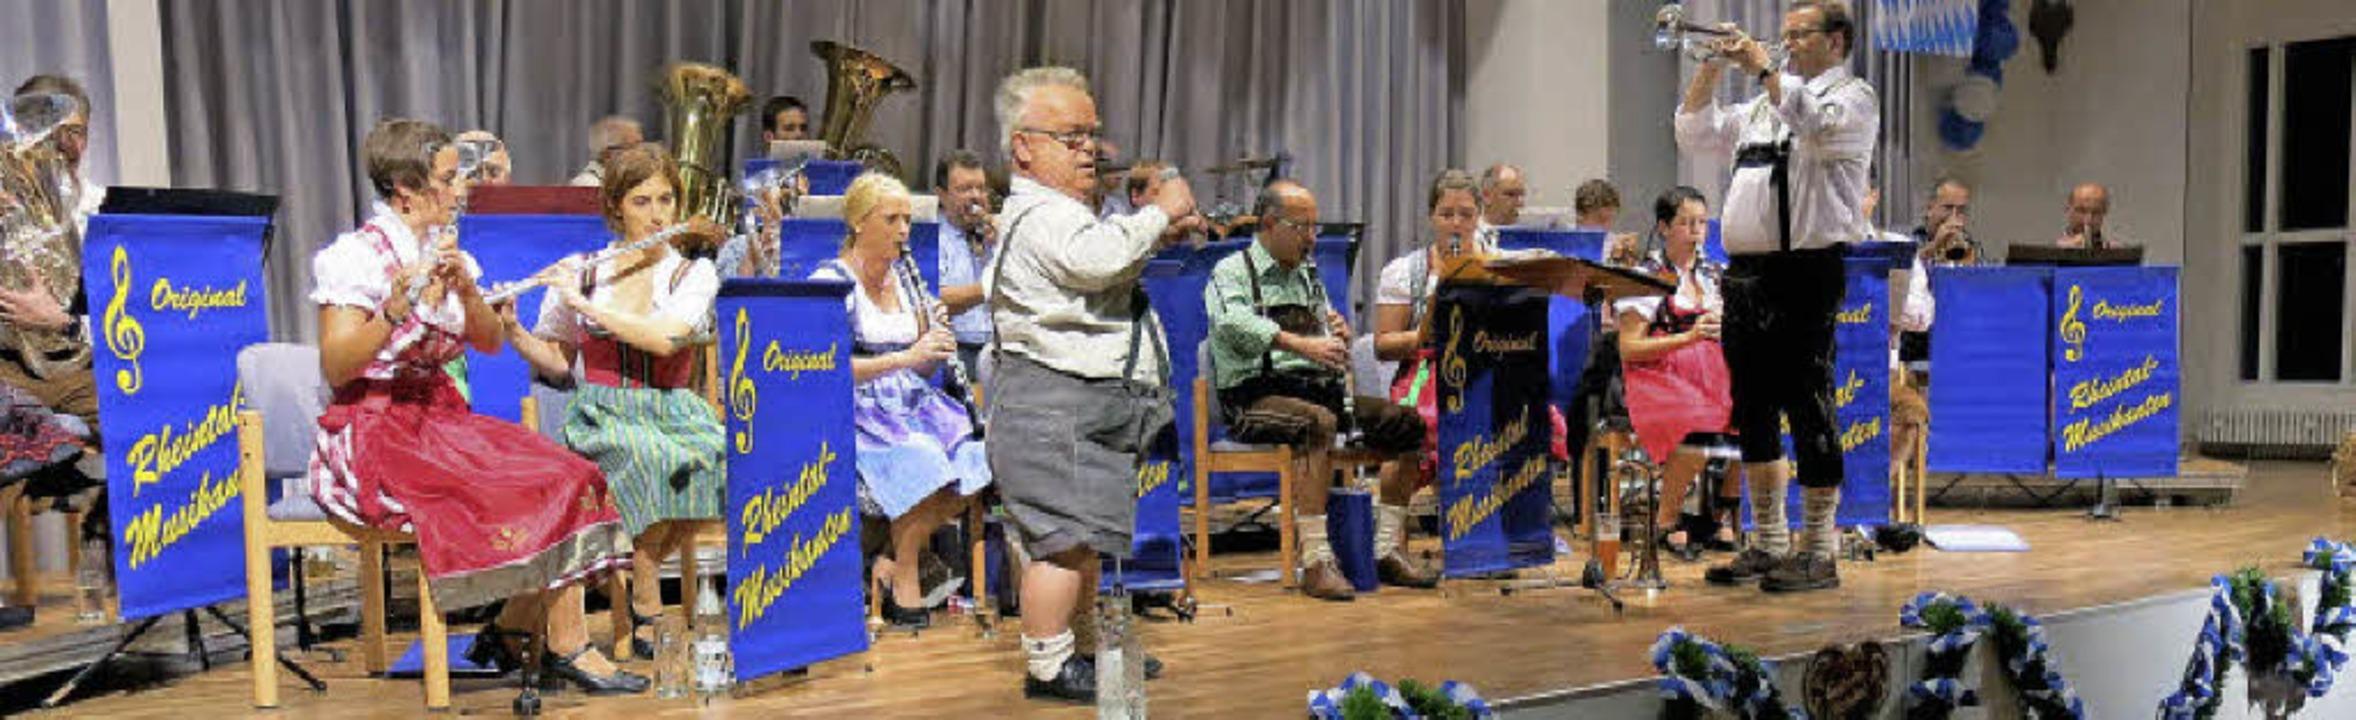 Spontane Gesangseinlage    Foto: Georg Voß